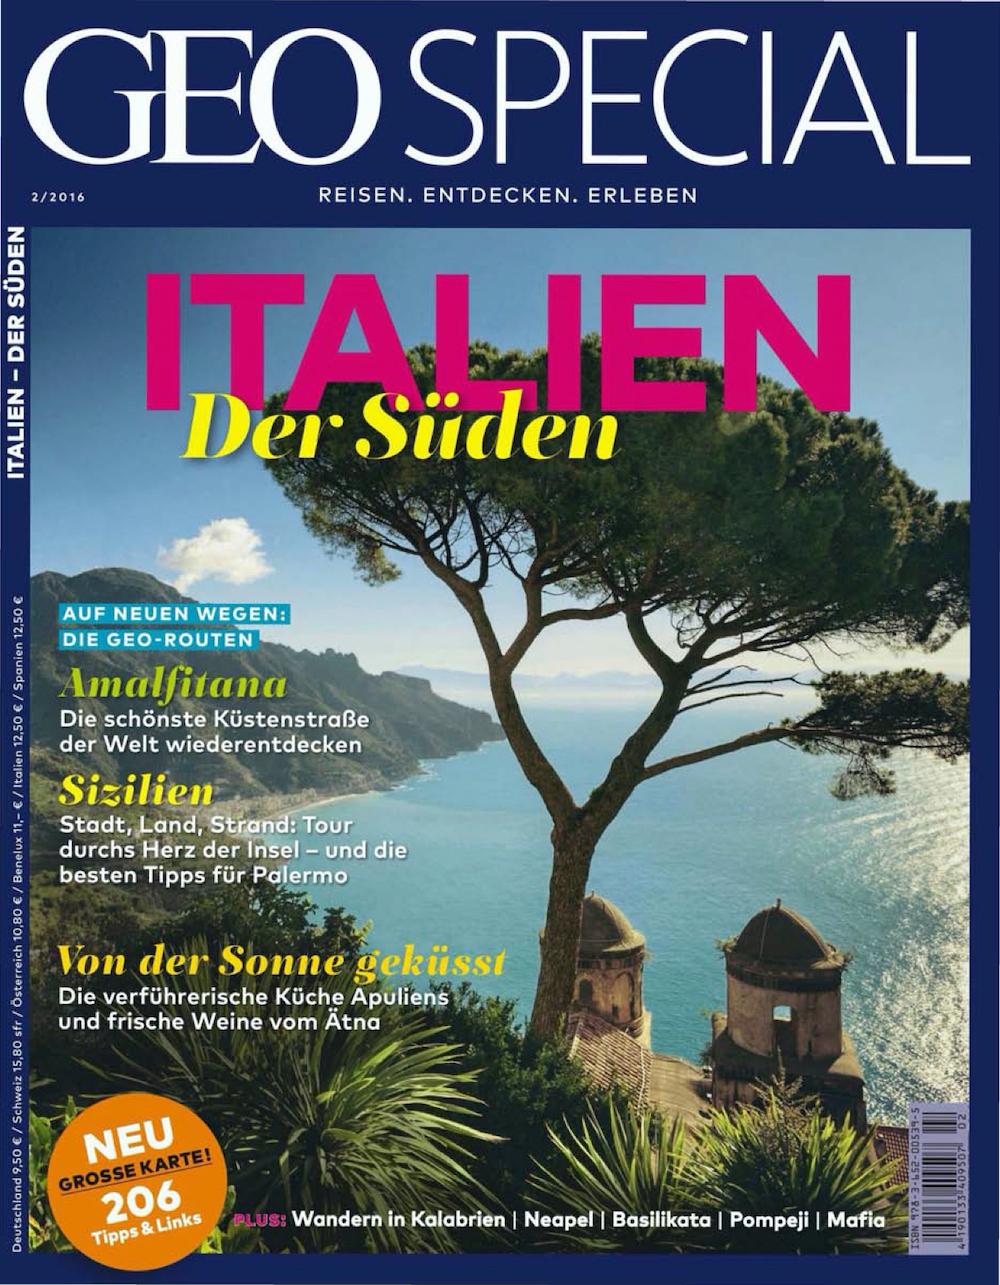 GEO Special 2016-02 Italien - DerSüden